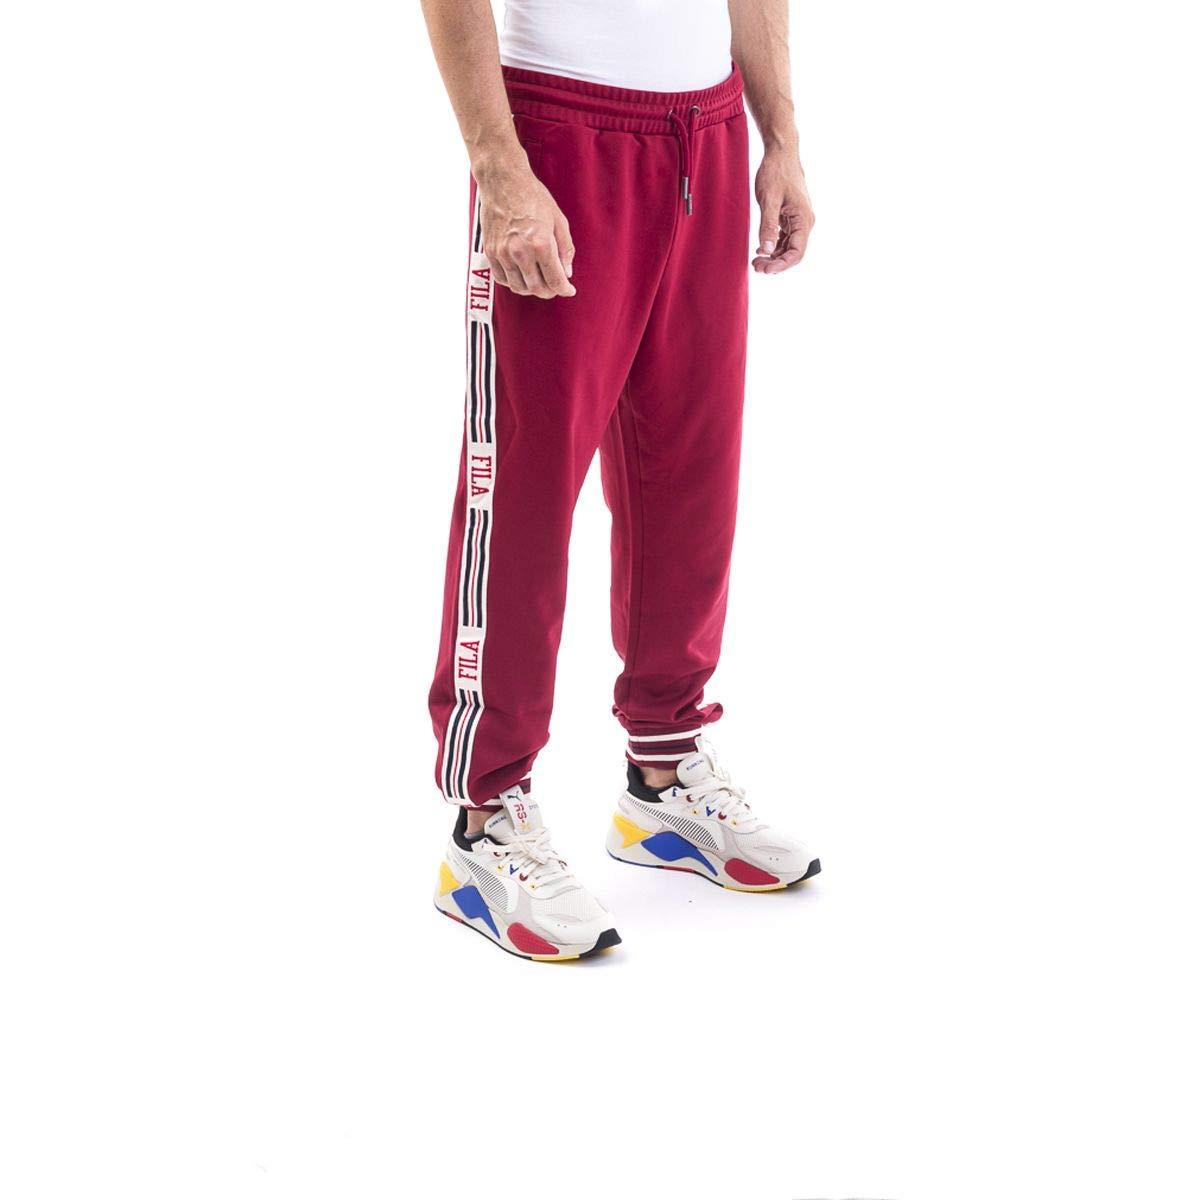 Fila Luxury Fashion 687301J93 - Chándal para hombre, color burdeos ...